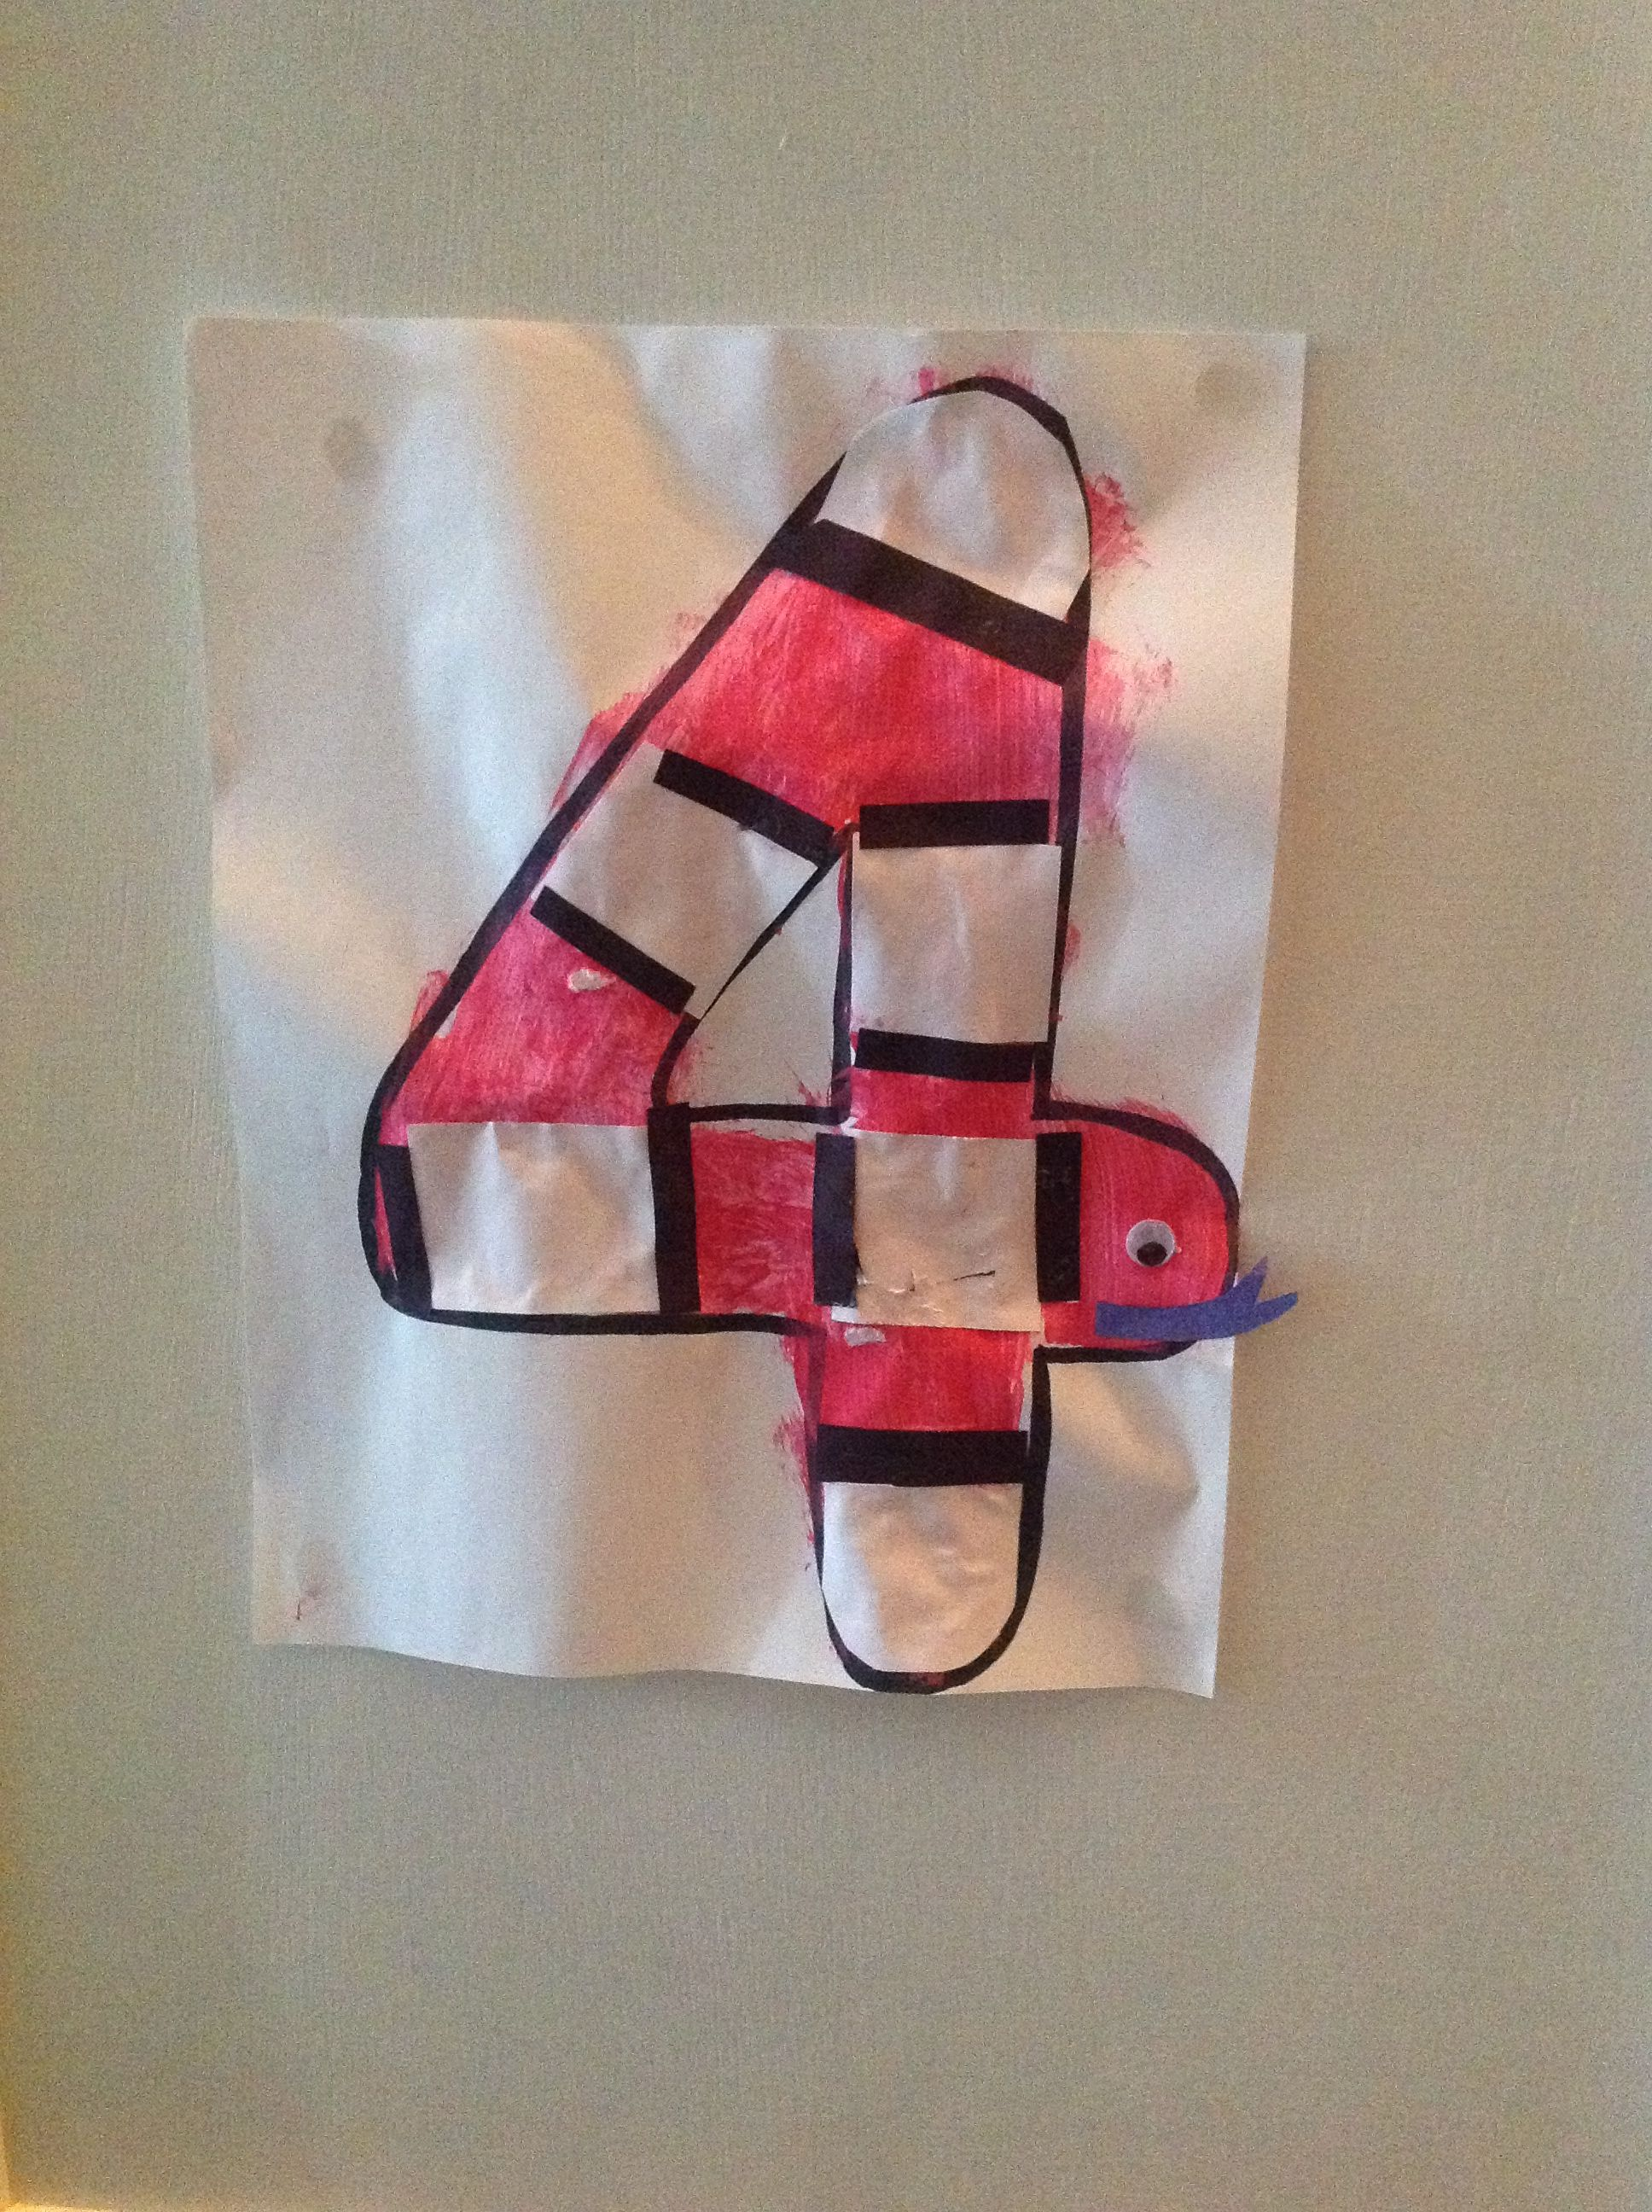 Number 4 Craft | Jake Dylan | Preschool crafts, Preschool ...